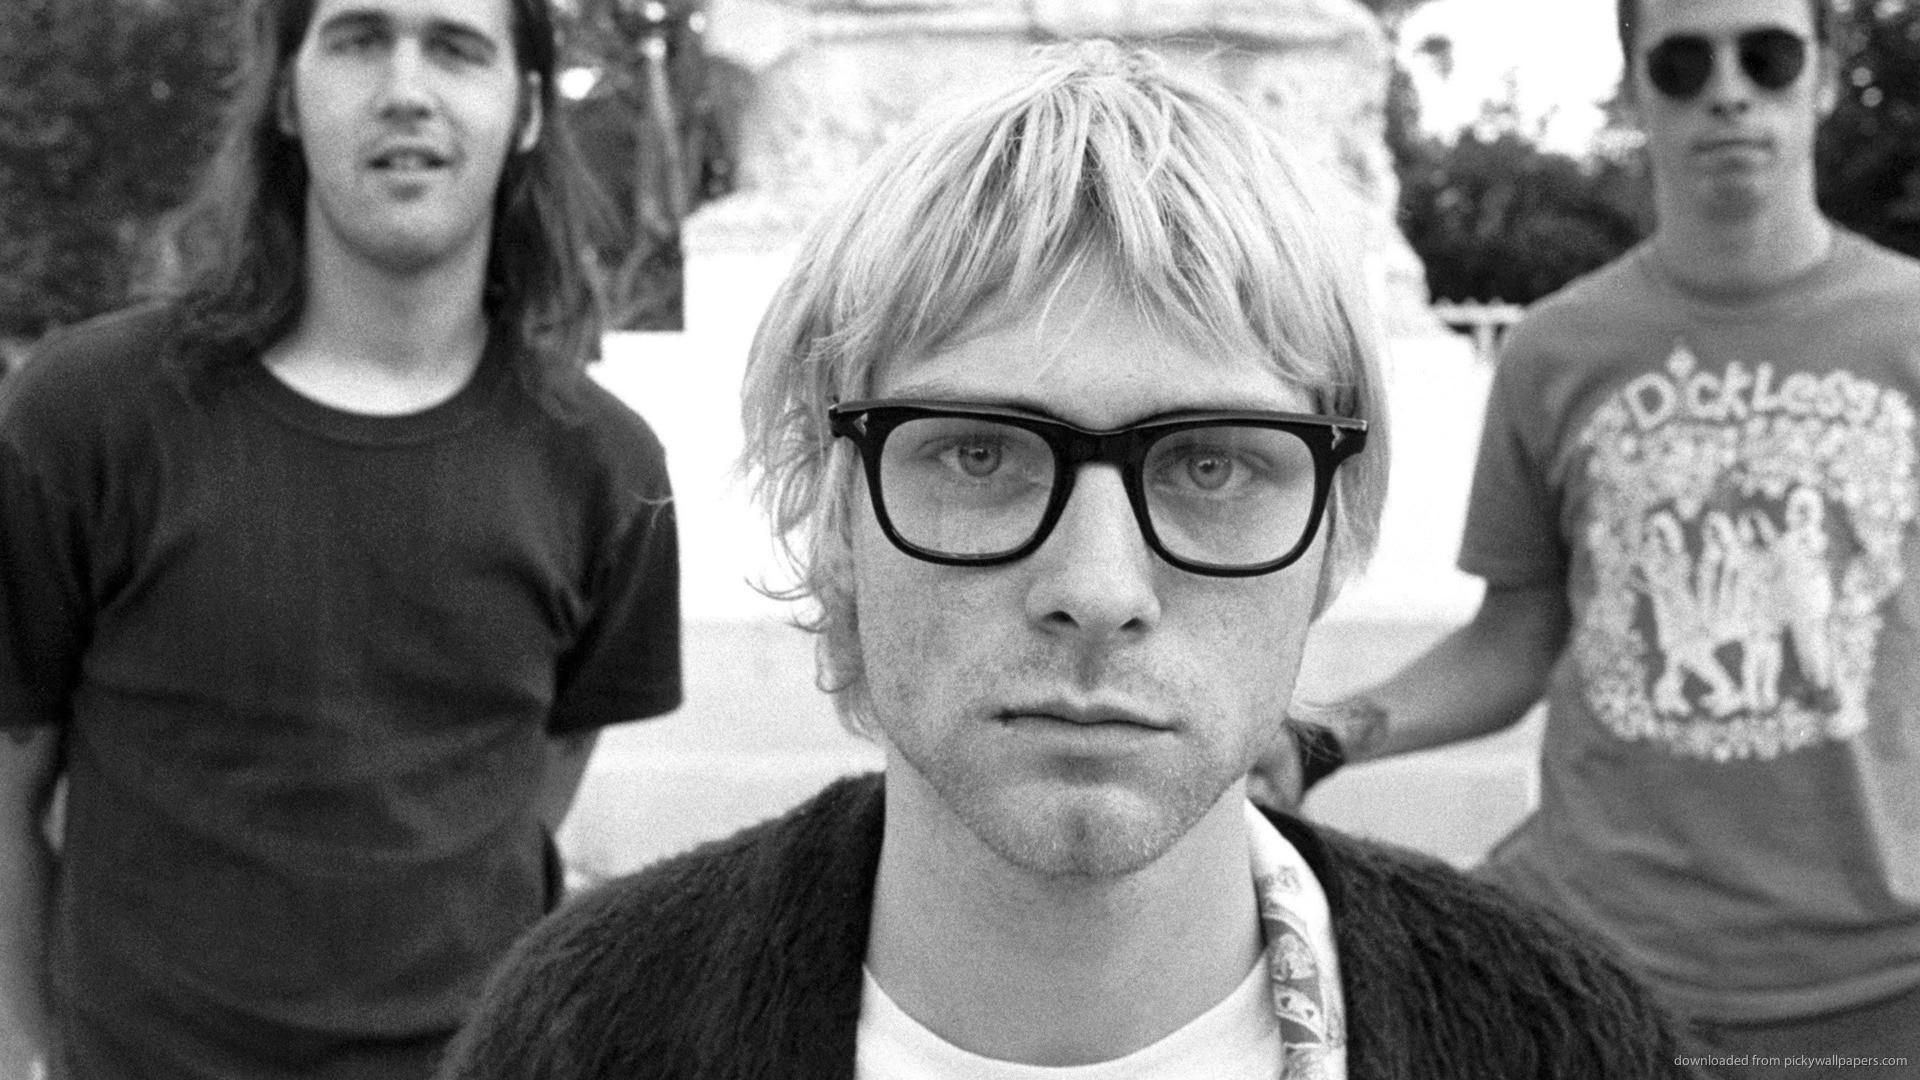 Nirvana Nerd Glasses picture